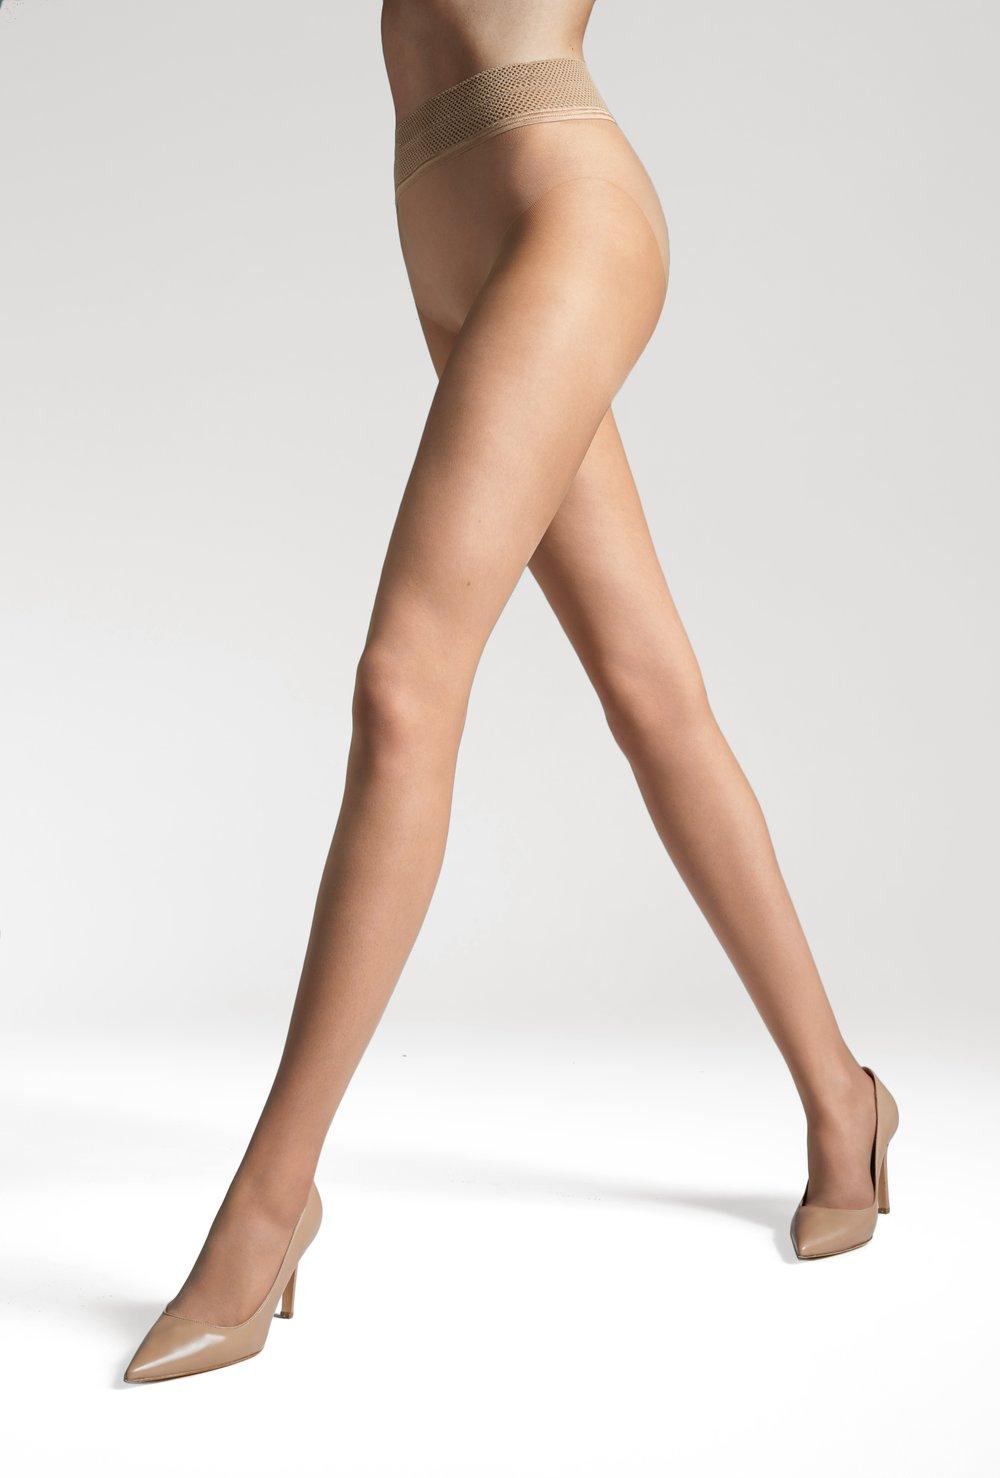 https://golden-legs.com.ua/images/stories/virtuemart/product/rajstopy-discrete-15-den-484a.1000x1478q85.jpg